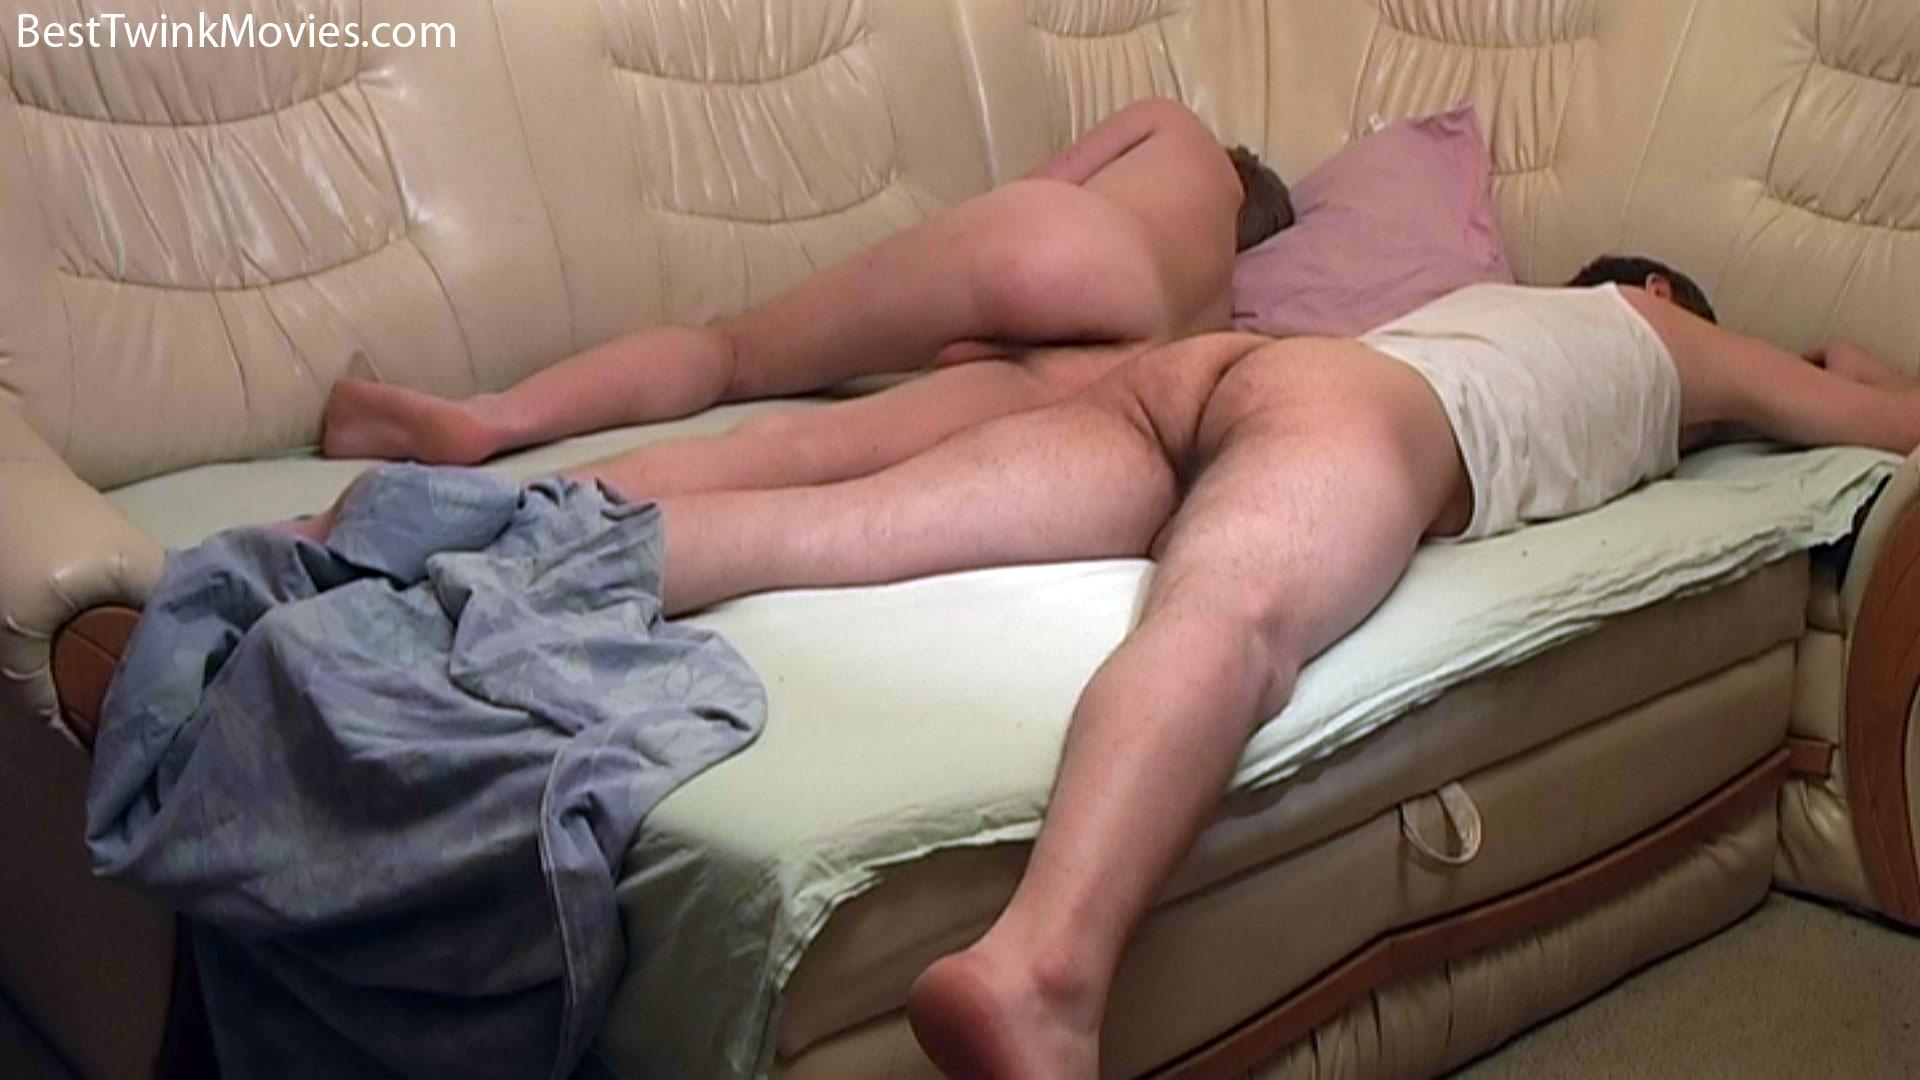 image Sleeping latino boy movies gay xxx once the